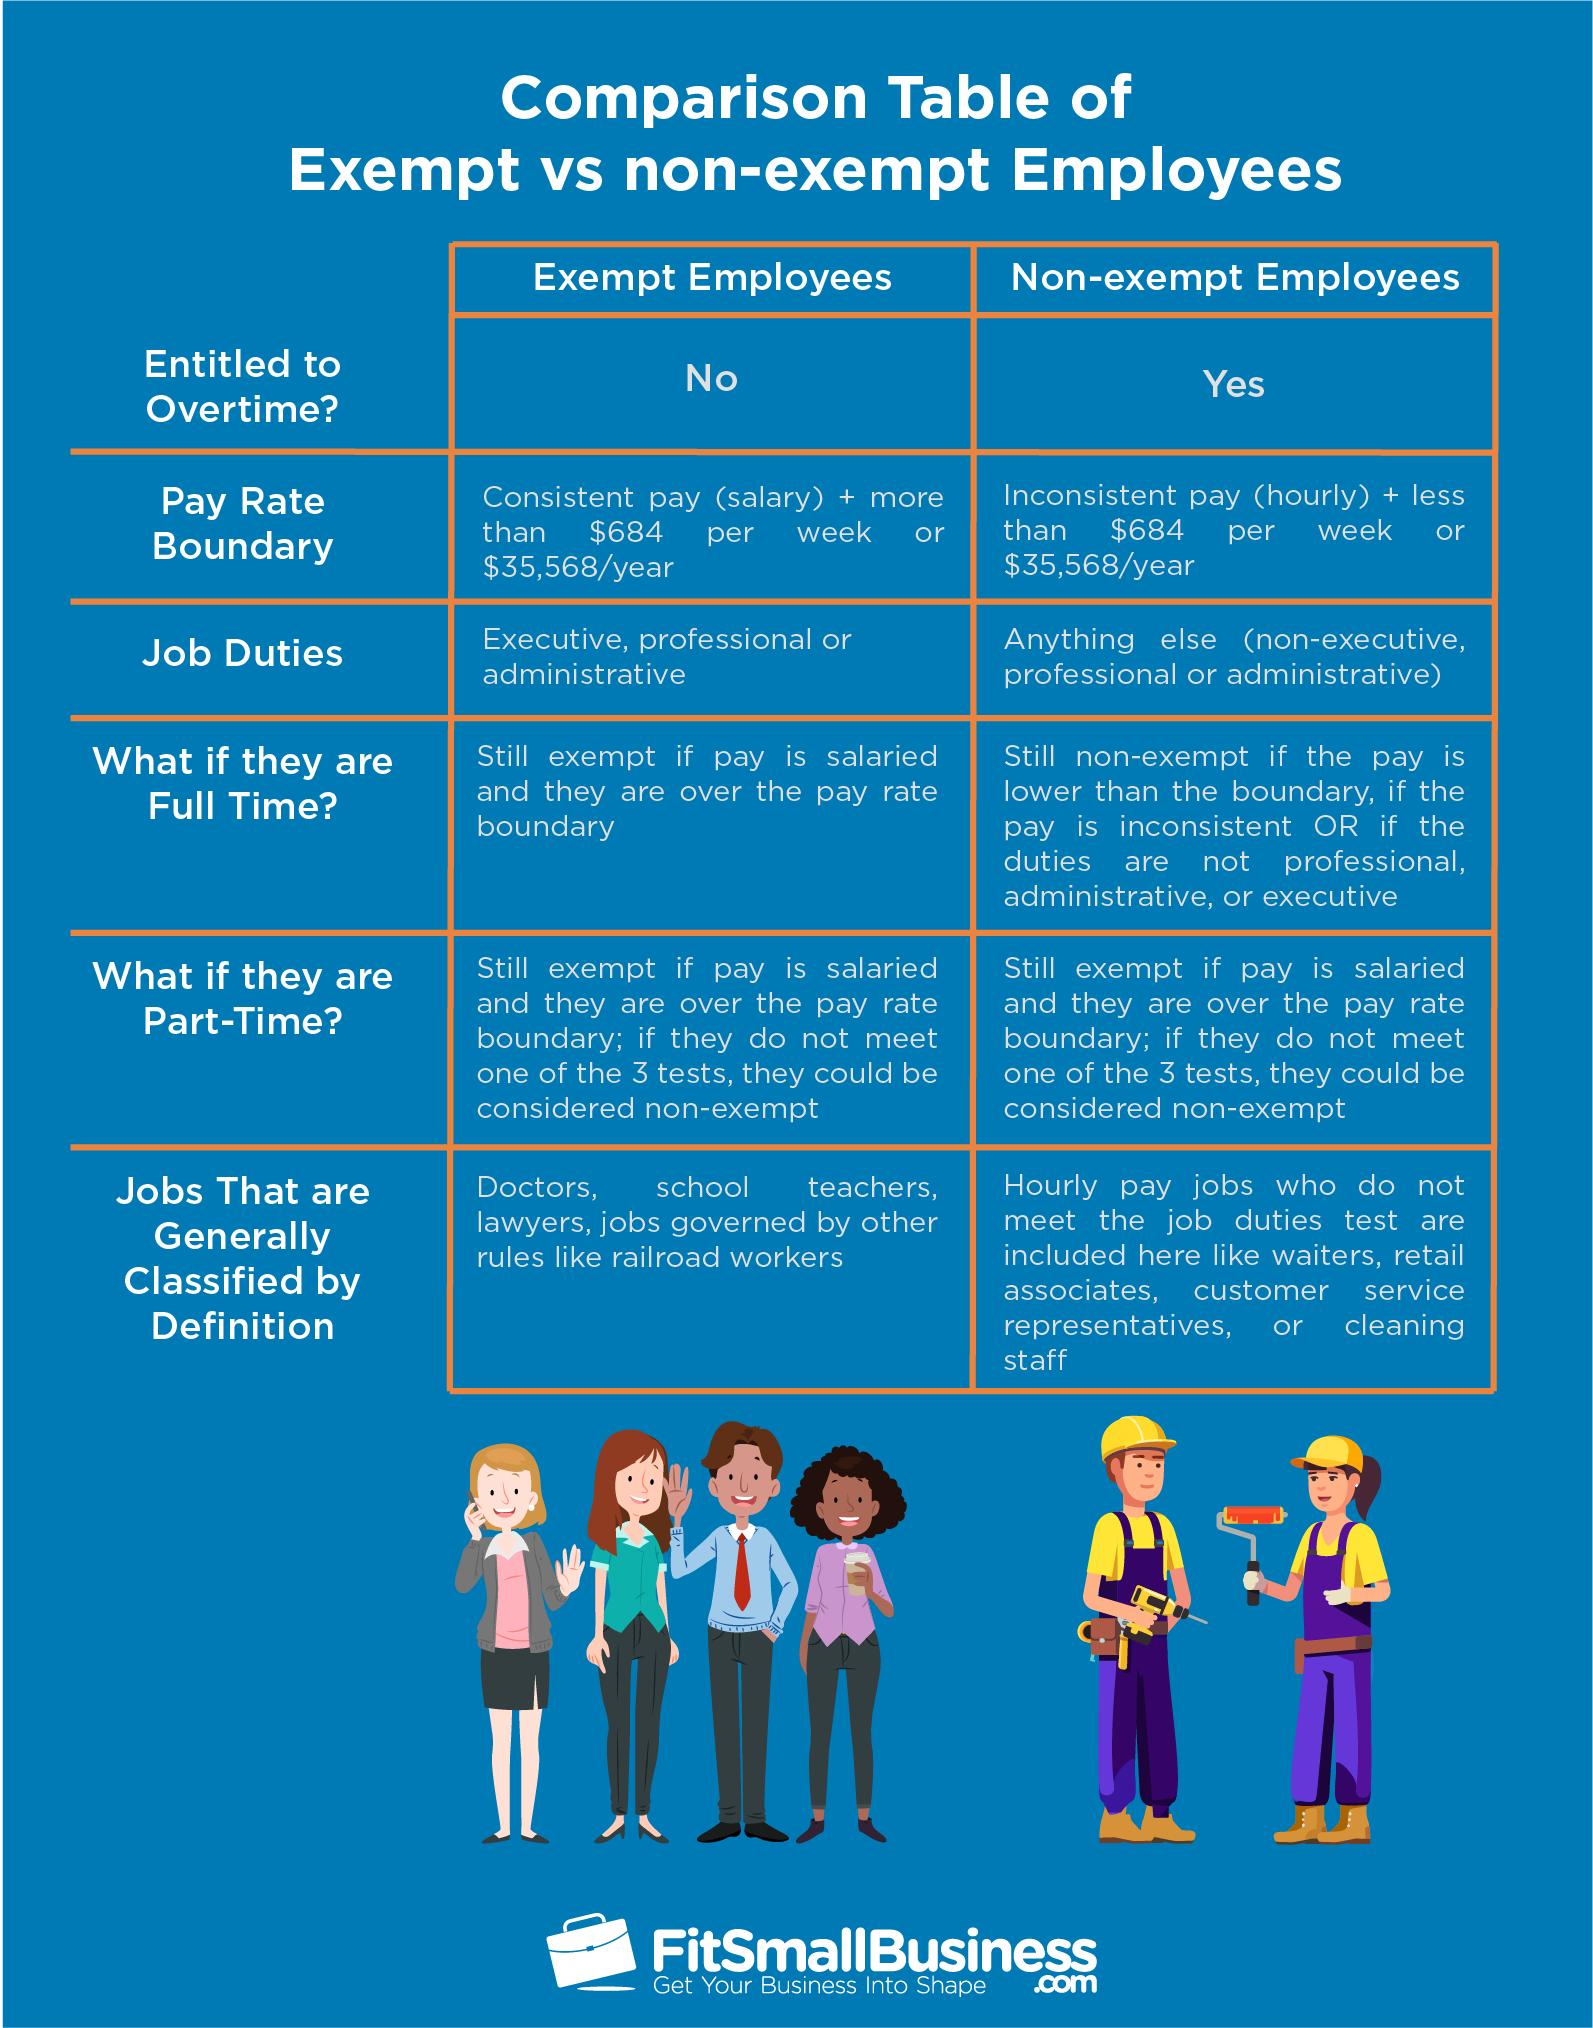 Comparison Table of Exempt vs non-exempt Employees